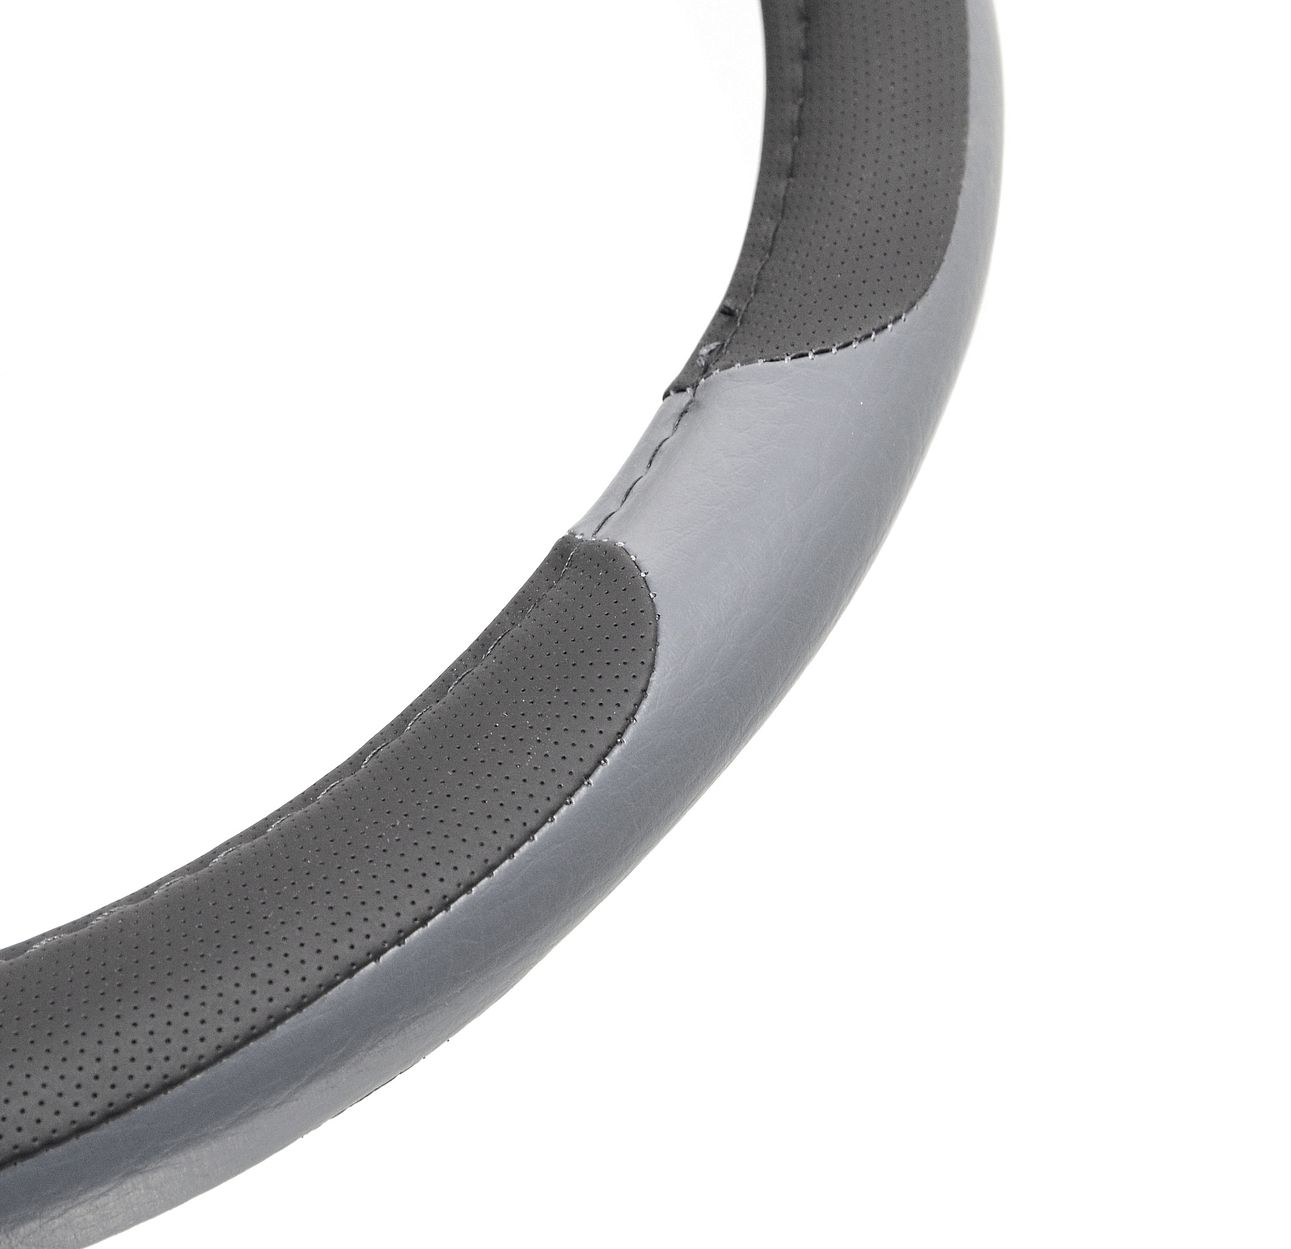 Potah volantu GRIP LARGE 42cm šedý